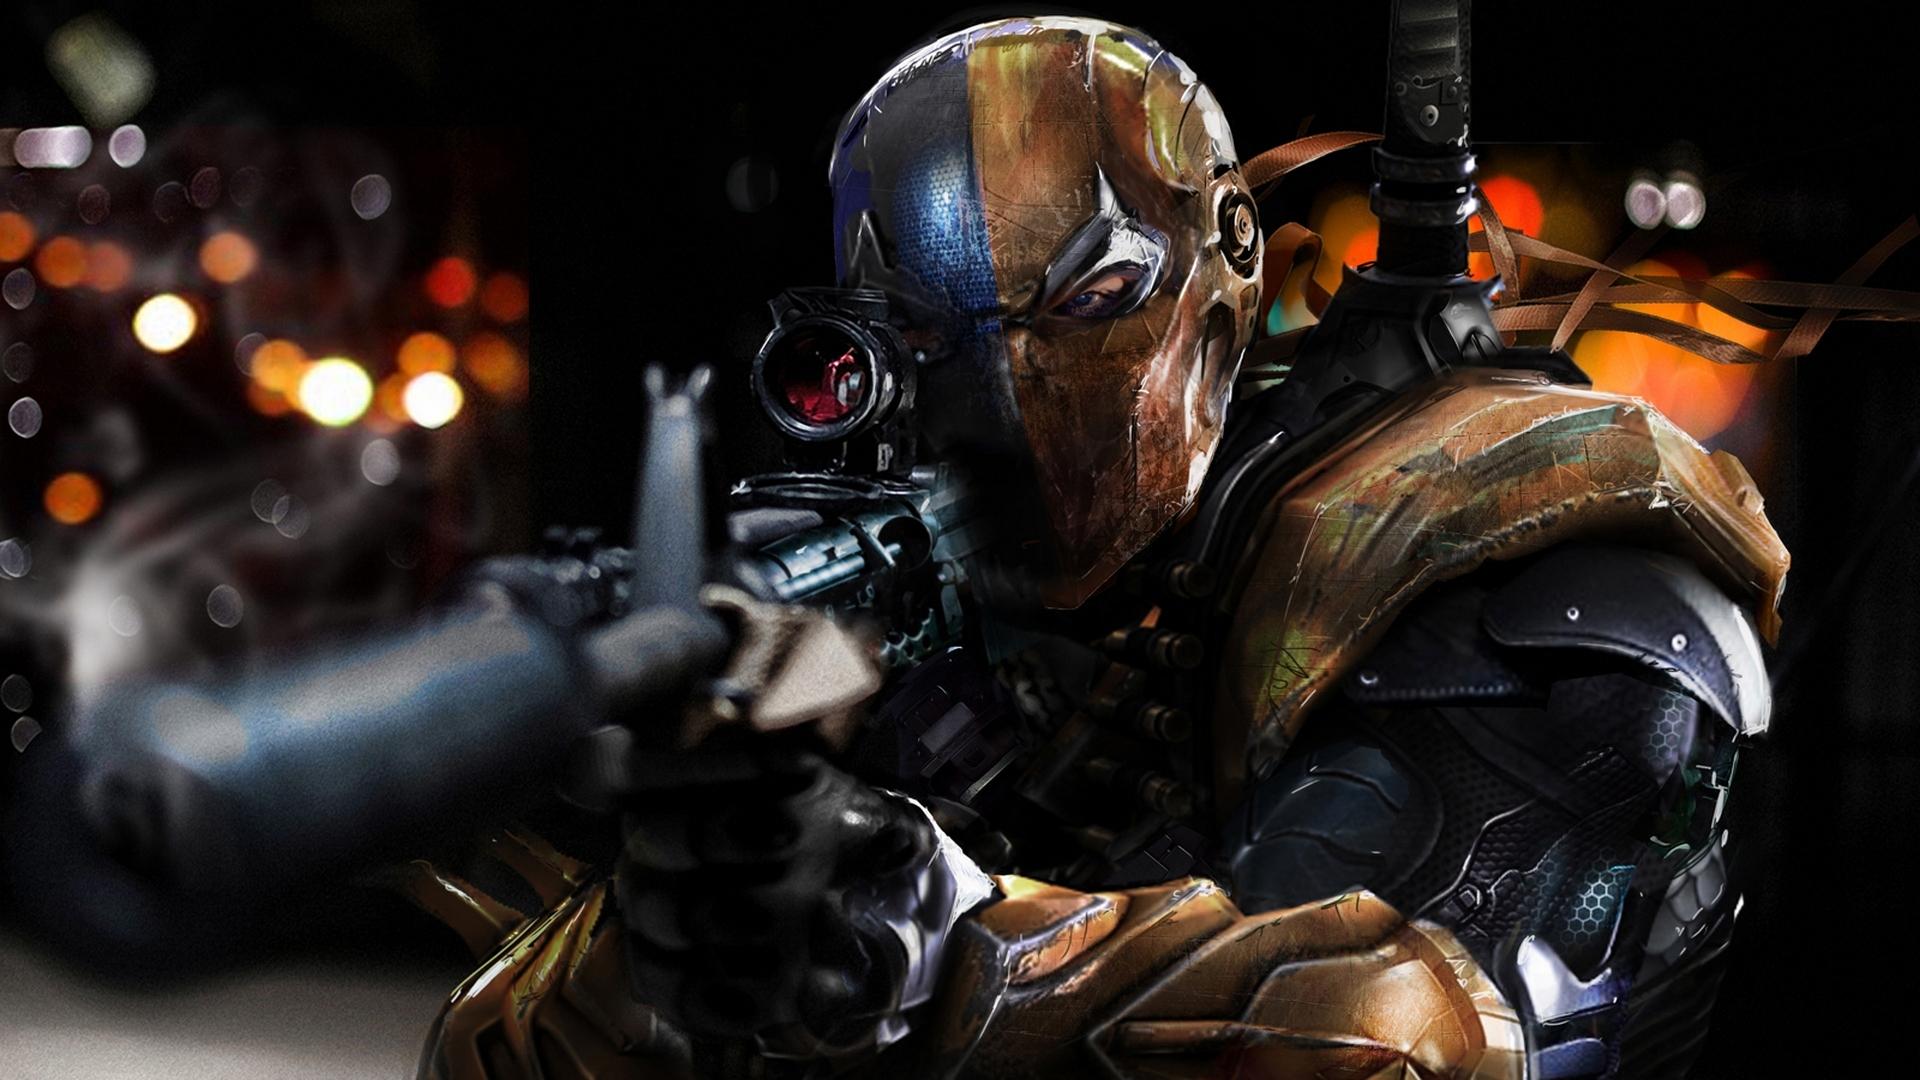 Deadpool Vs Deathstroke Wallpaper Photo - Wickedsa com